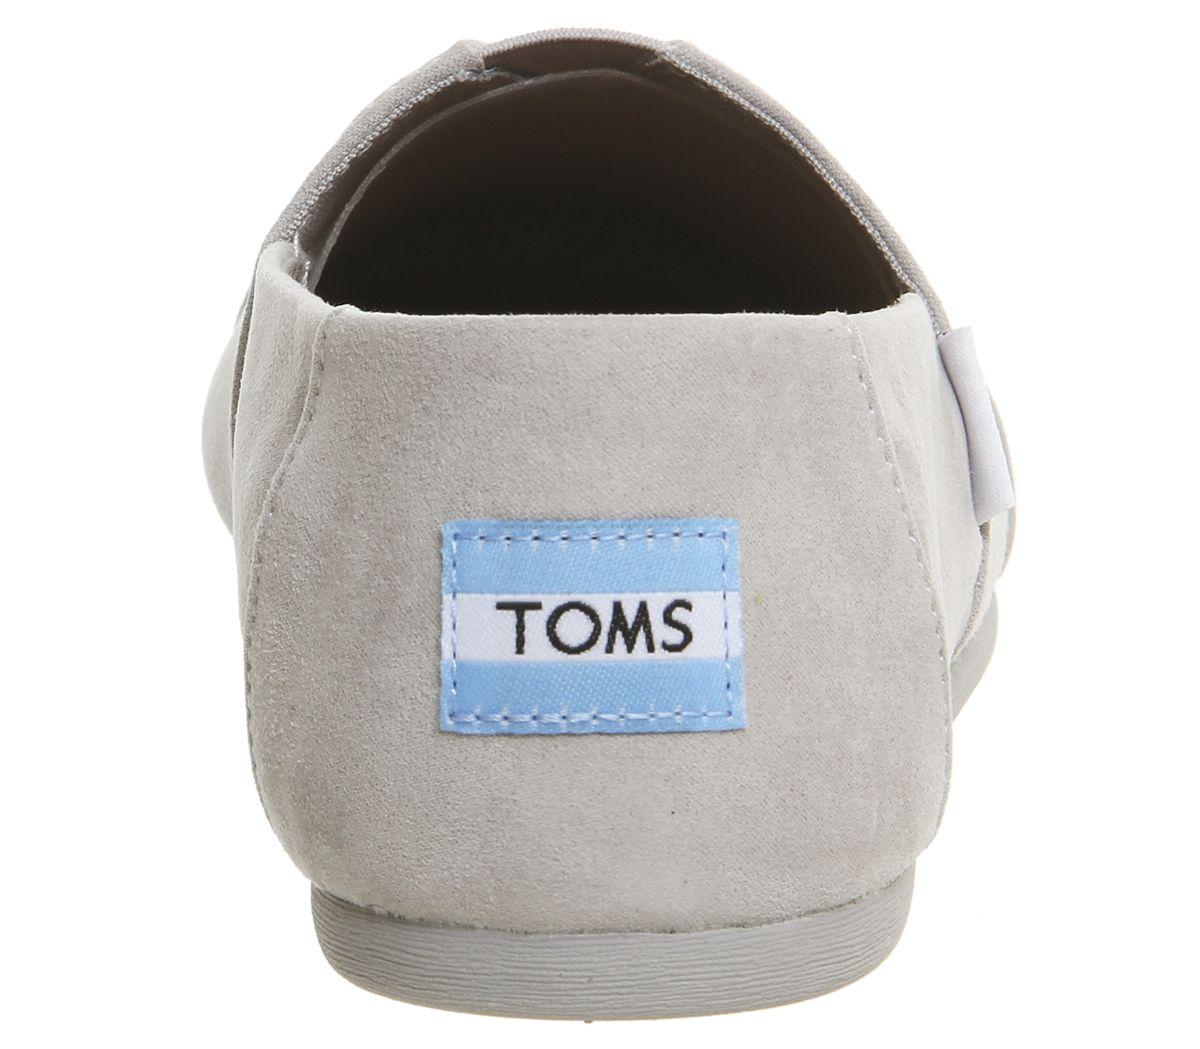 Womens-Toms-Seasonal-Classic-Slip-On-Drizzle-Grey-Flats thumbnail 11